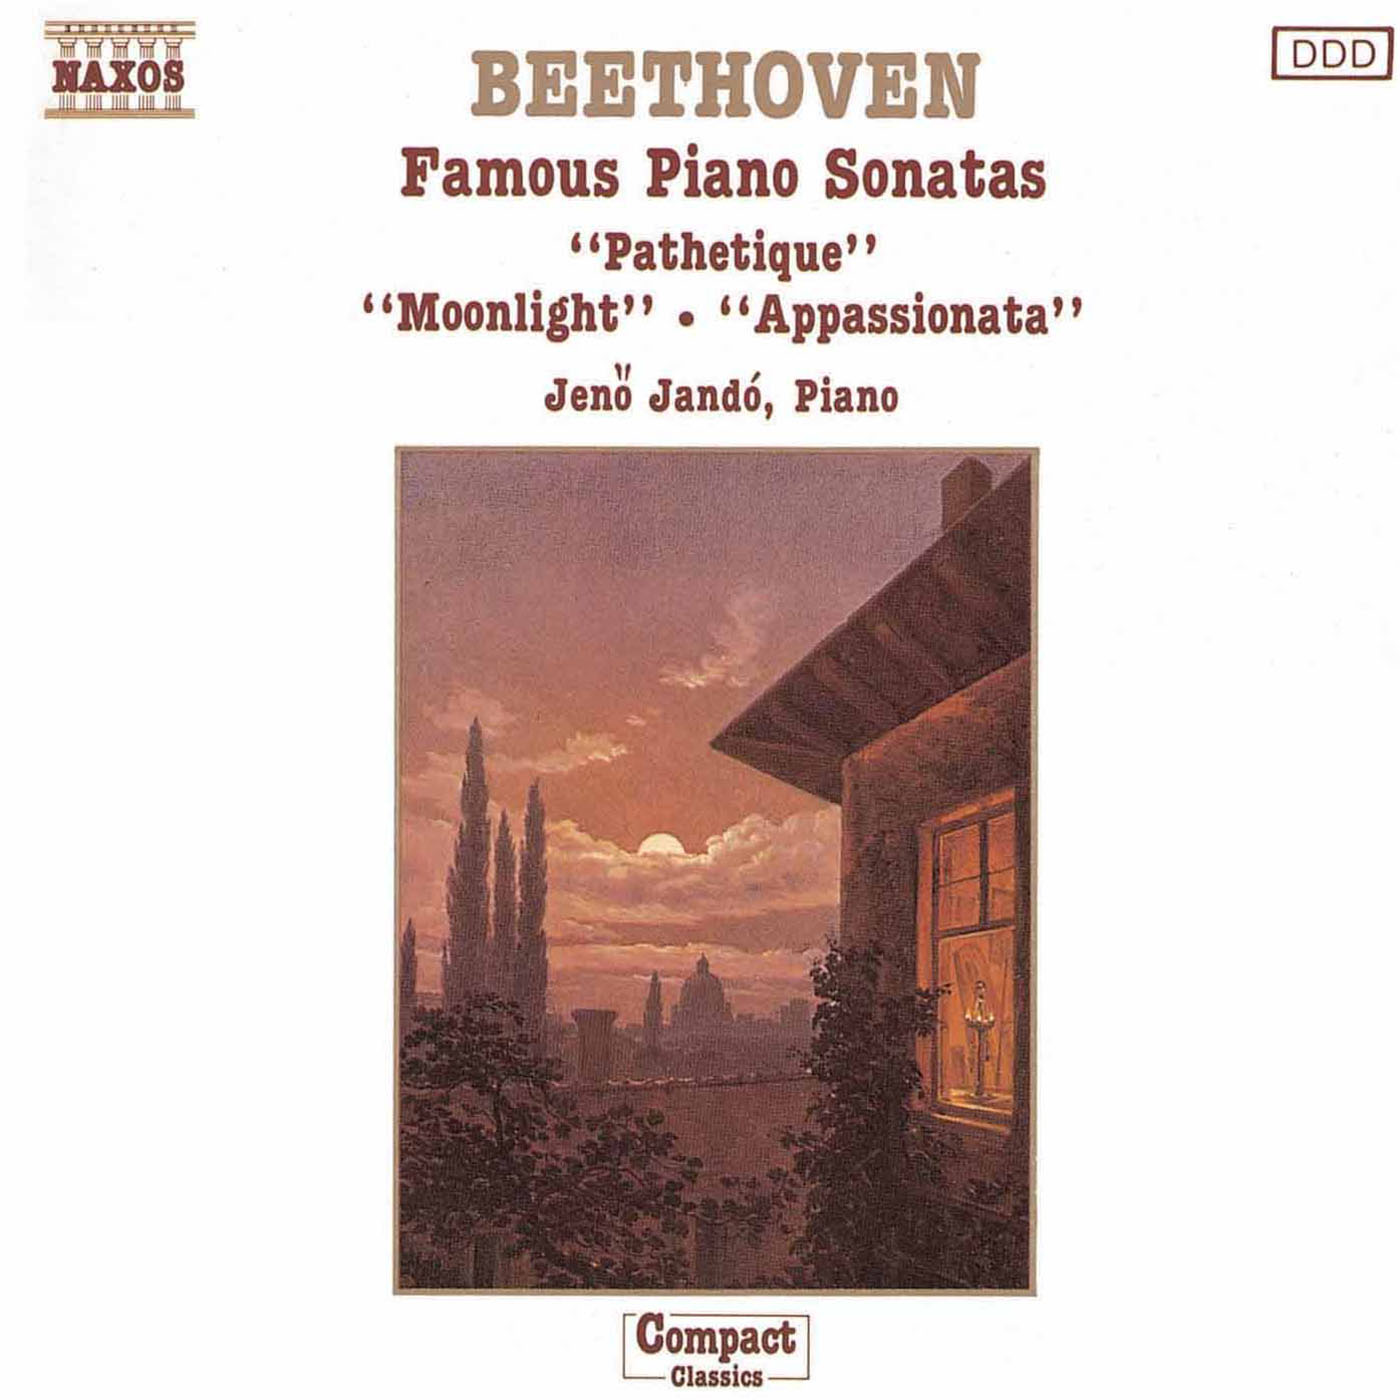 Beethoven: Piano Sonatas Nos. 8, 14 and 23